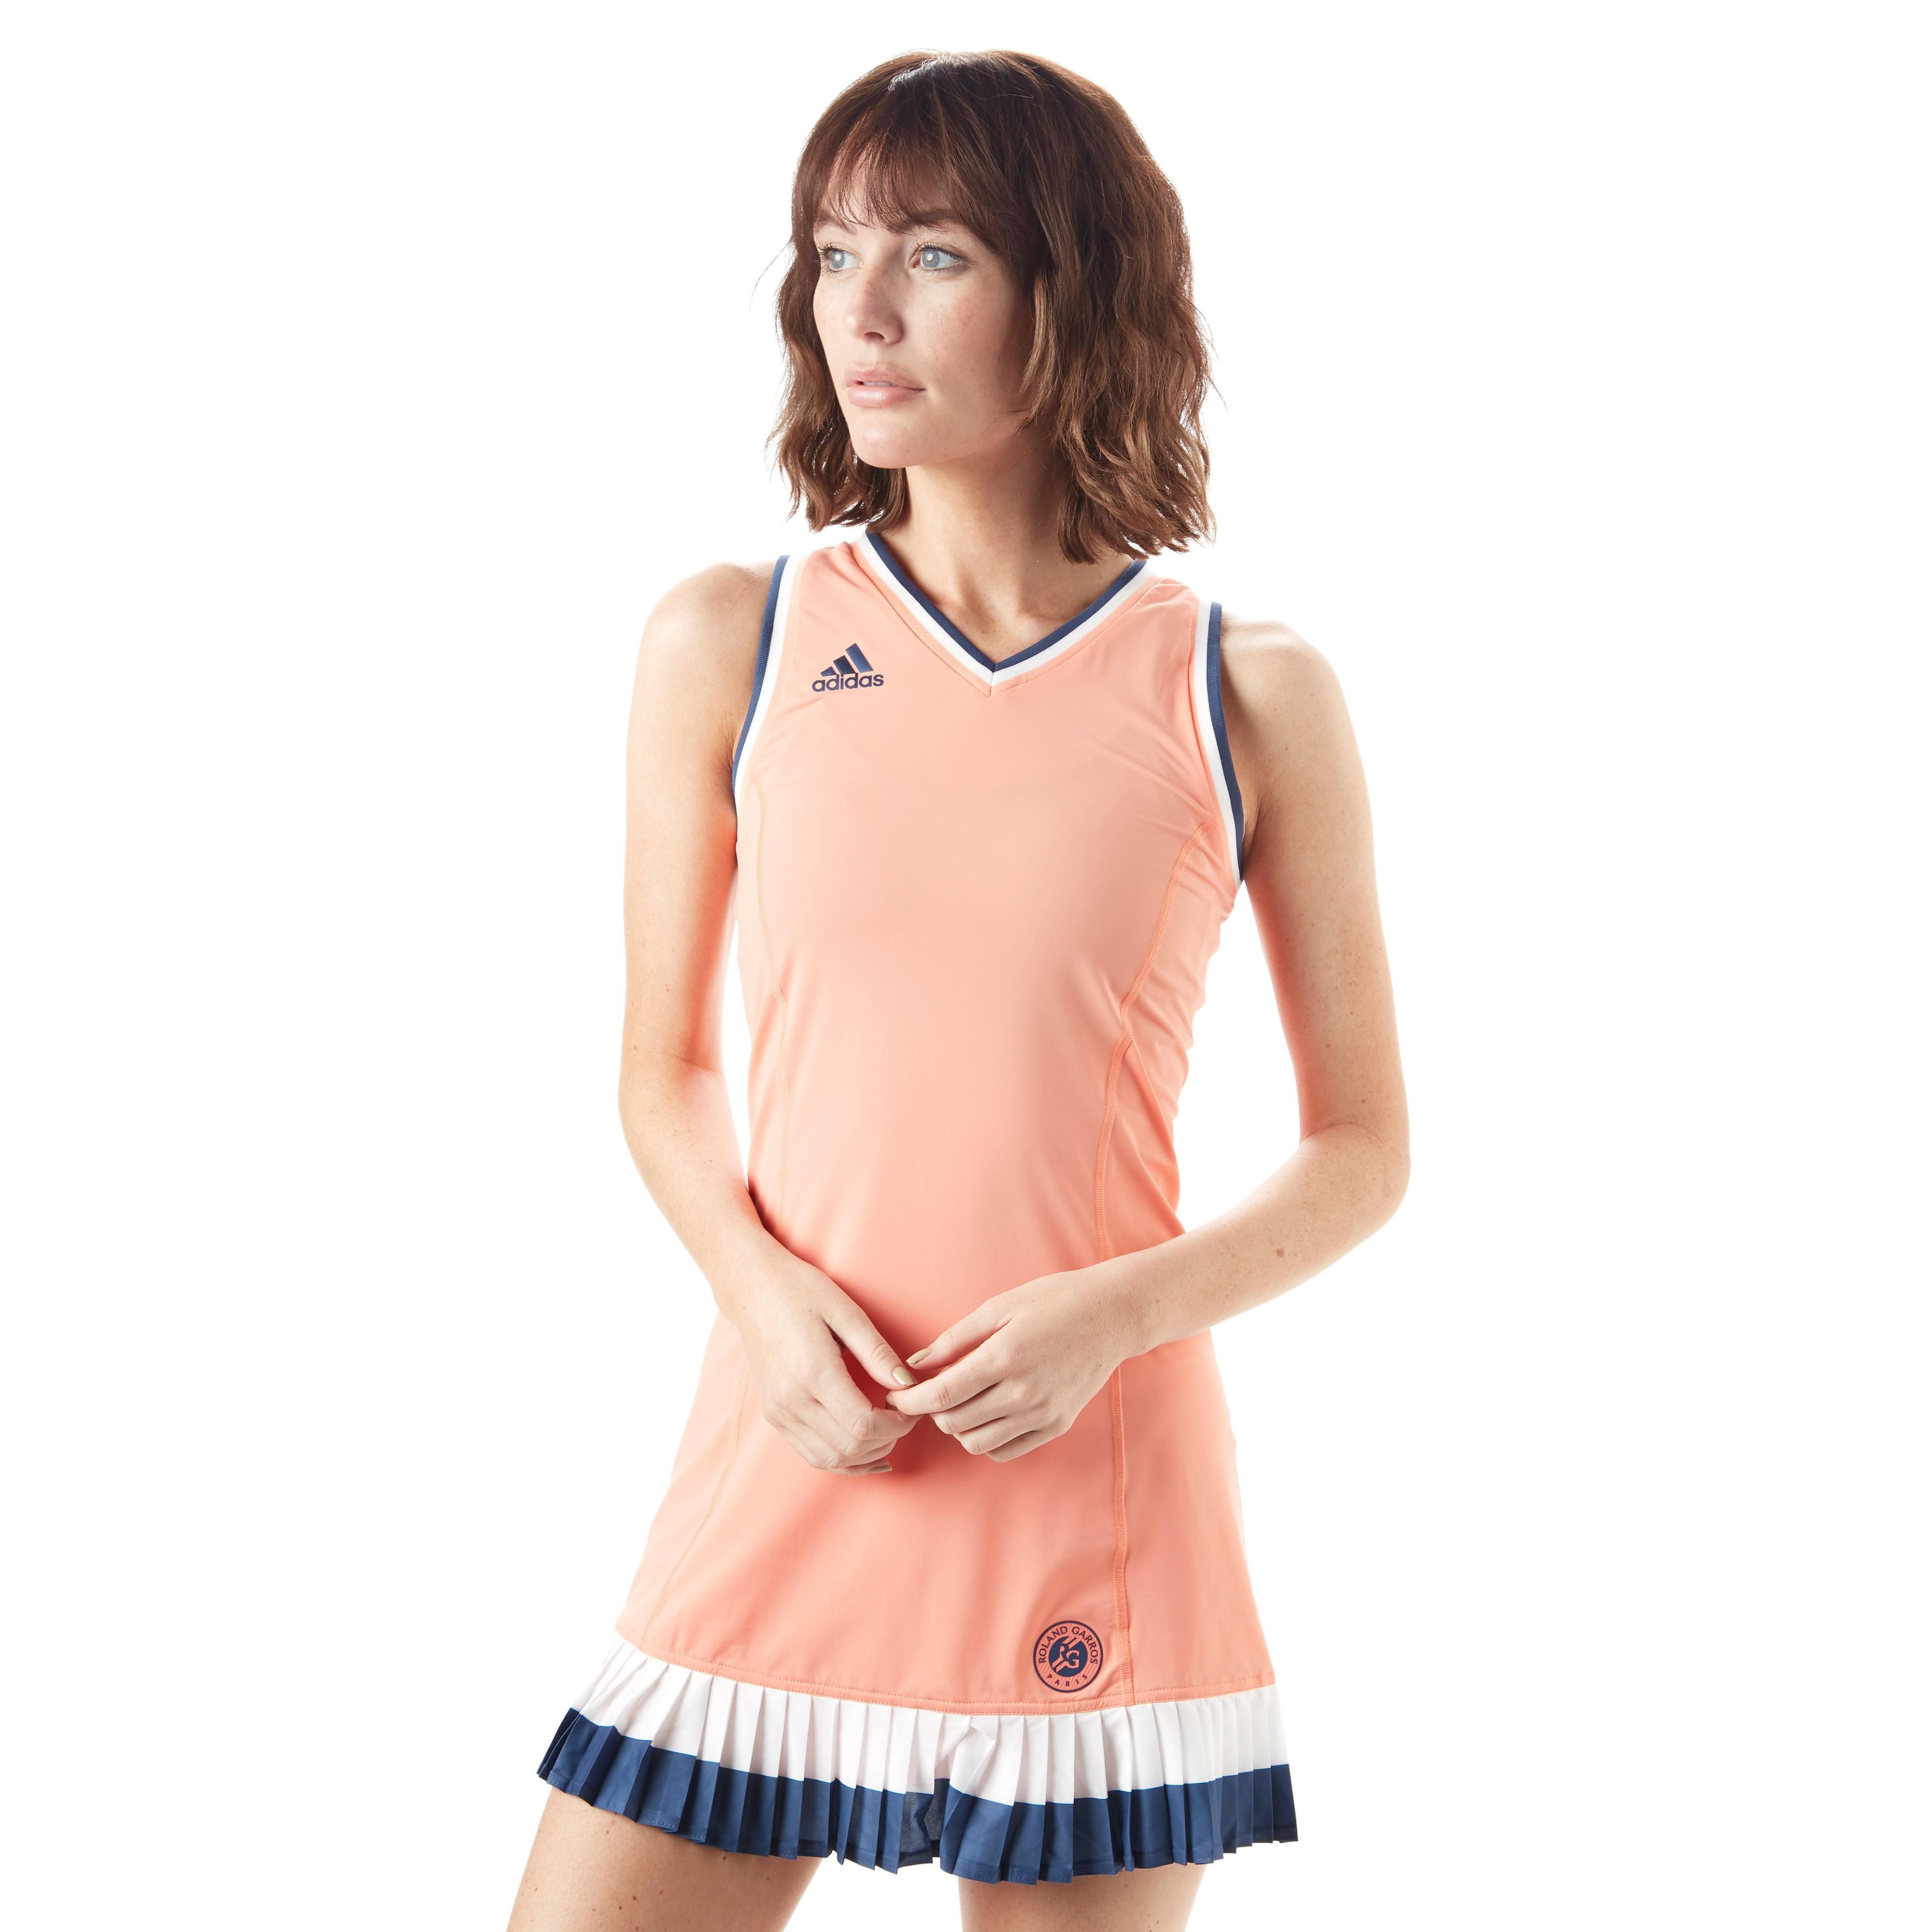 adidas Roland Garros Women's Tennis Dress